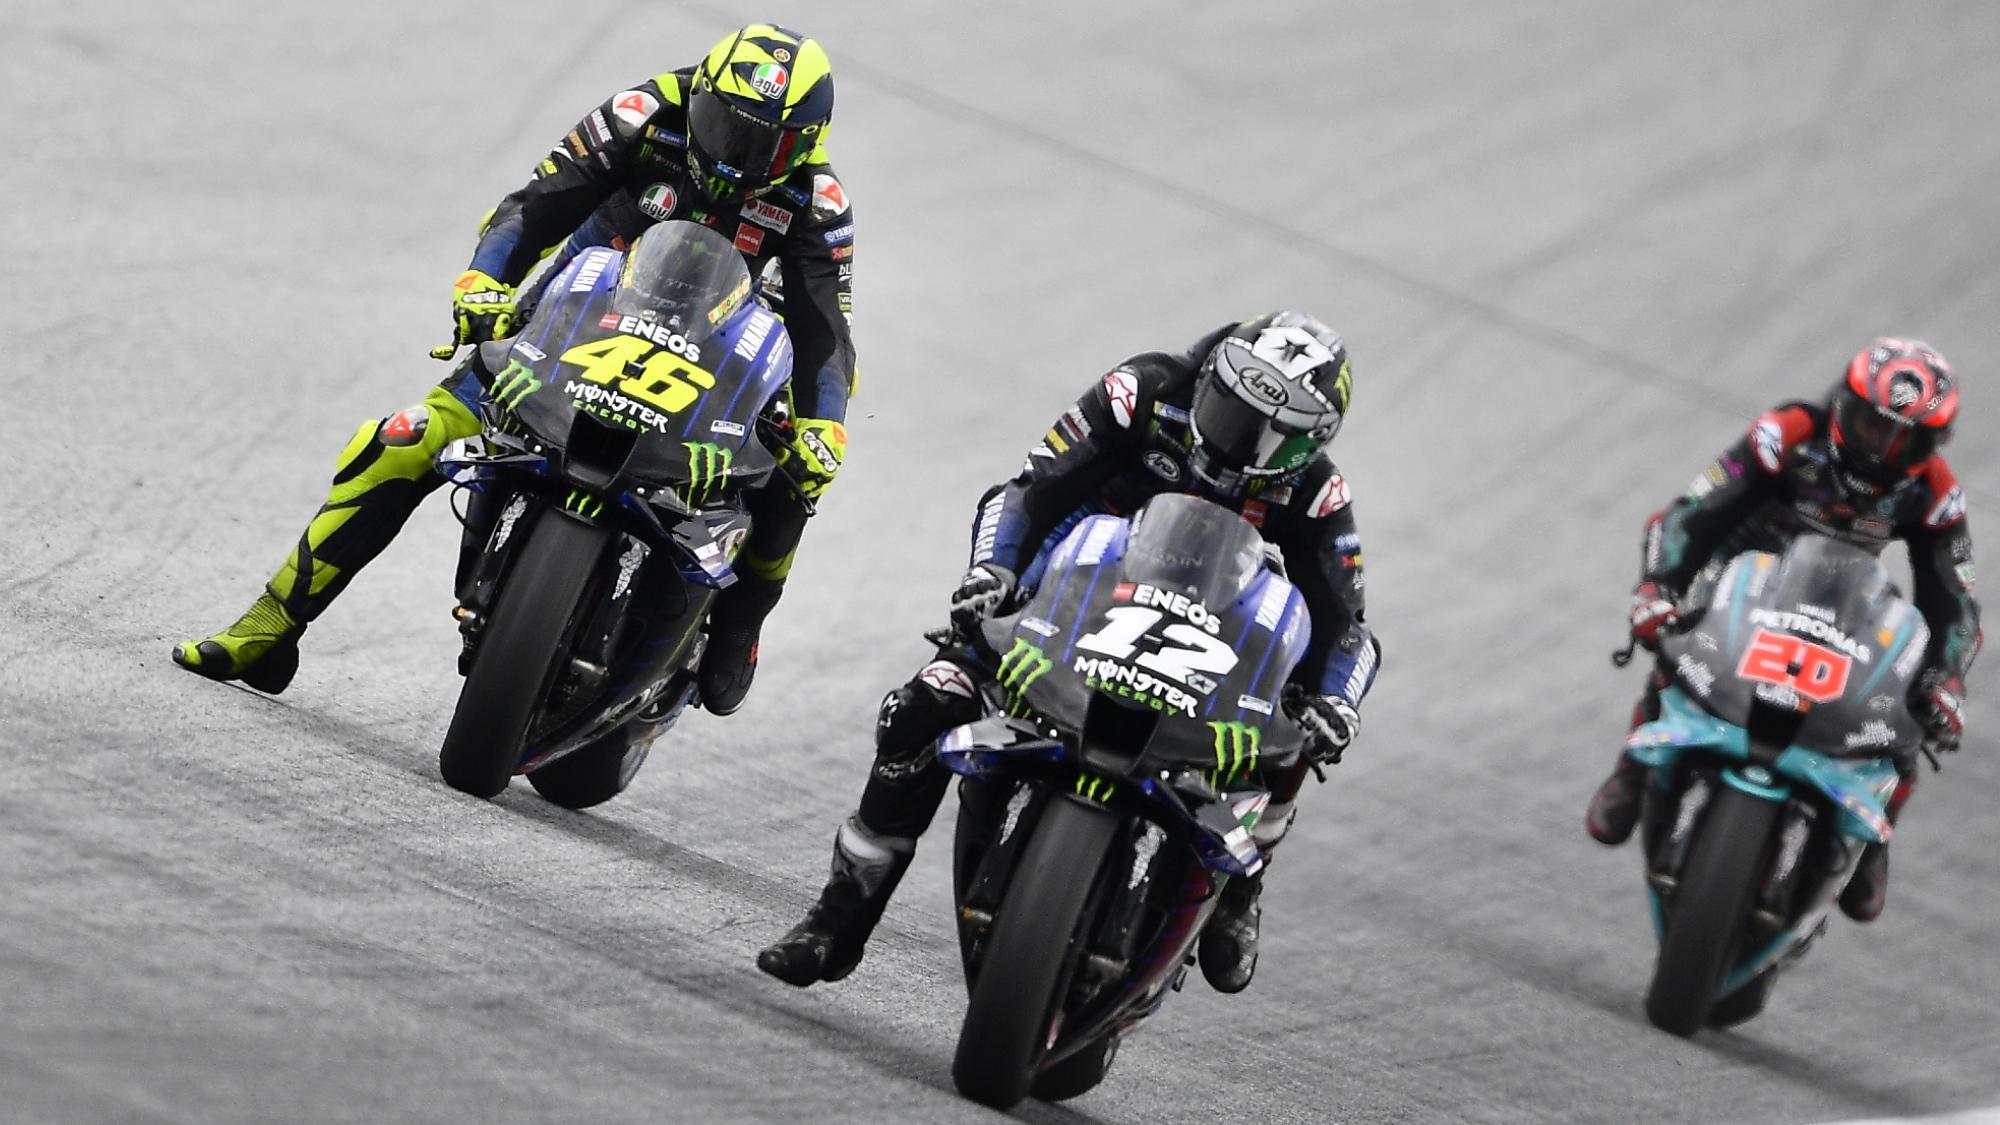 Valentino Rossi, Maverick Vinales, Austria MotoGP 2020